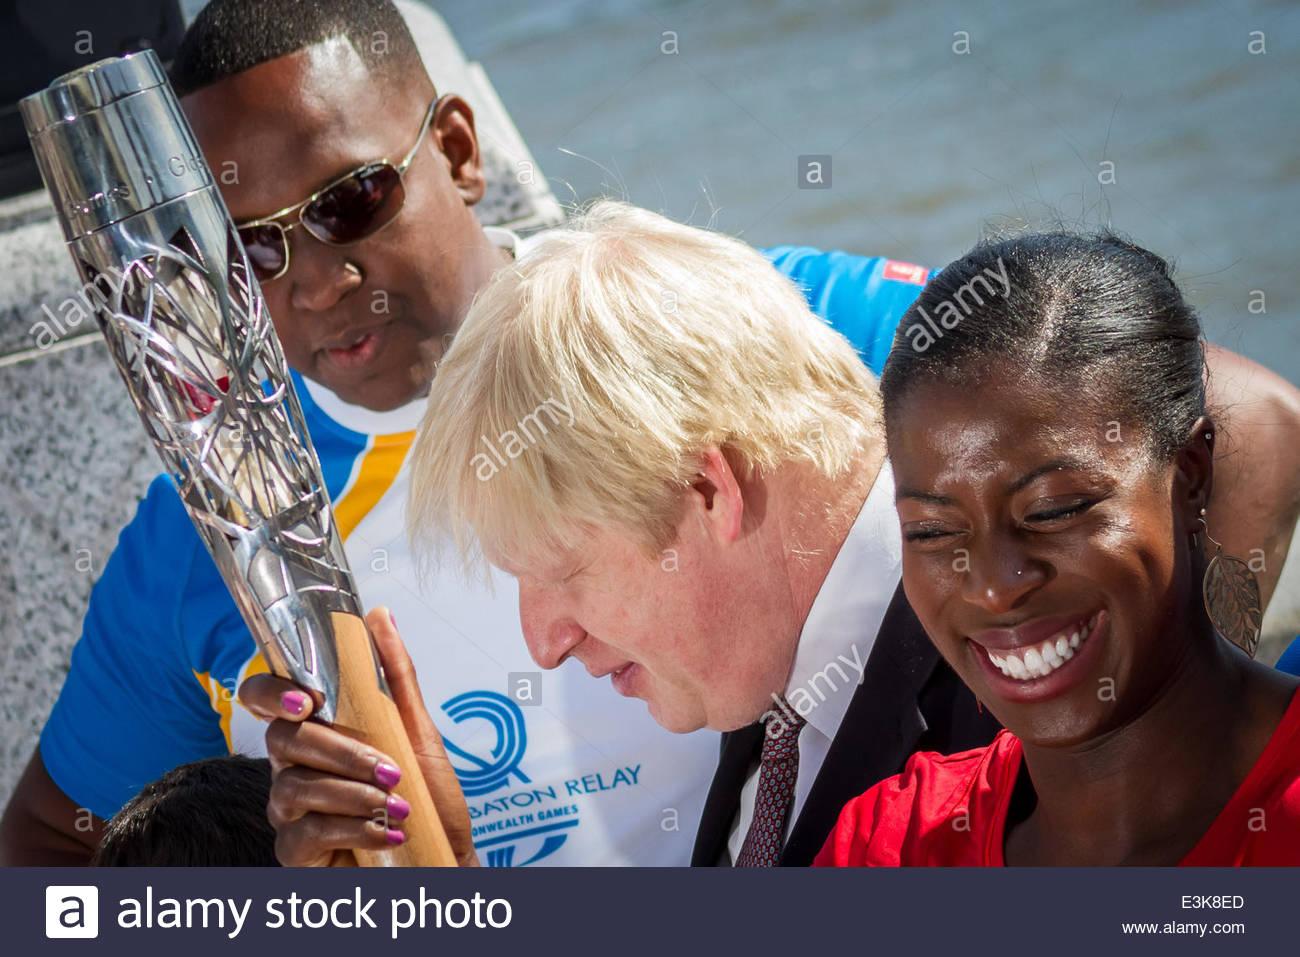 London Mayor Boris Johnson welcomes Commonwealth Games Queen's Baton Relay to London - Stock Image